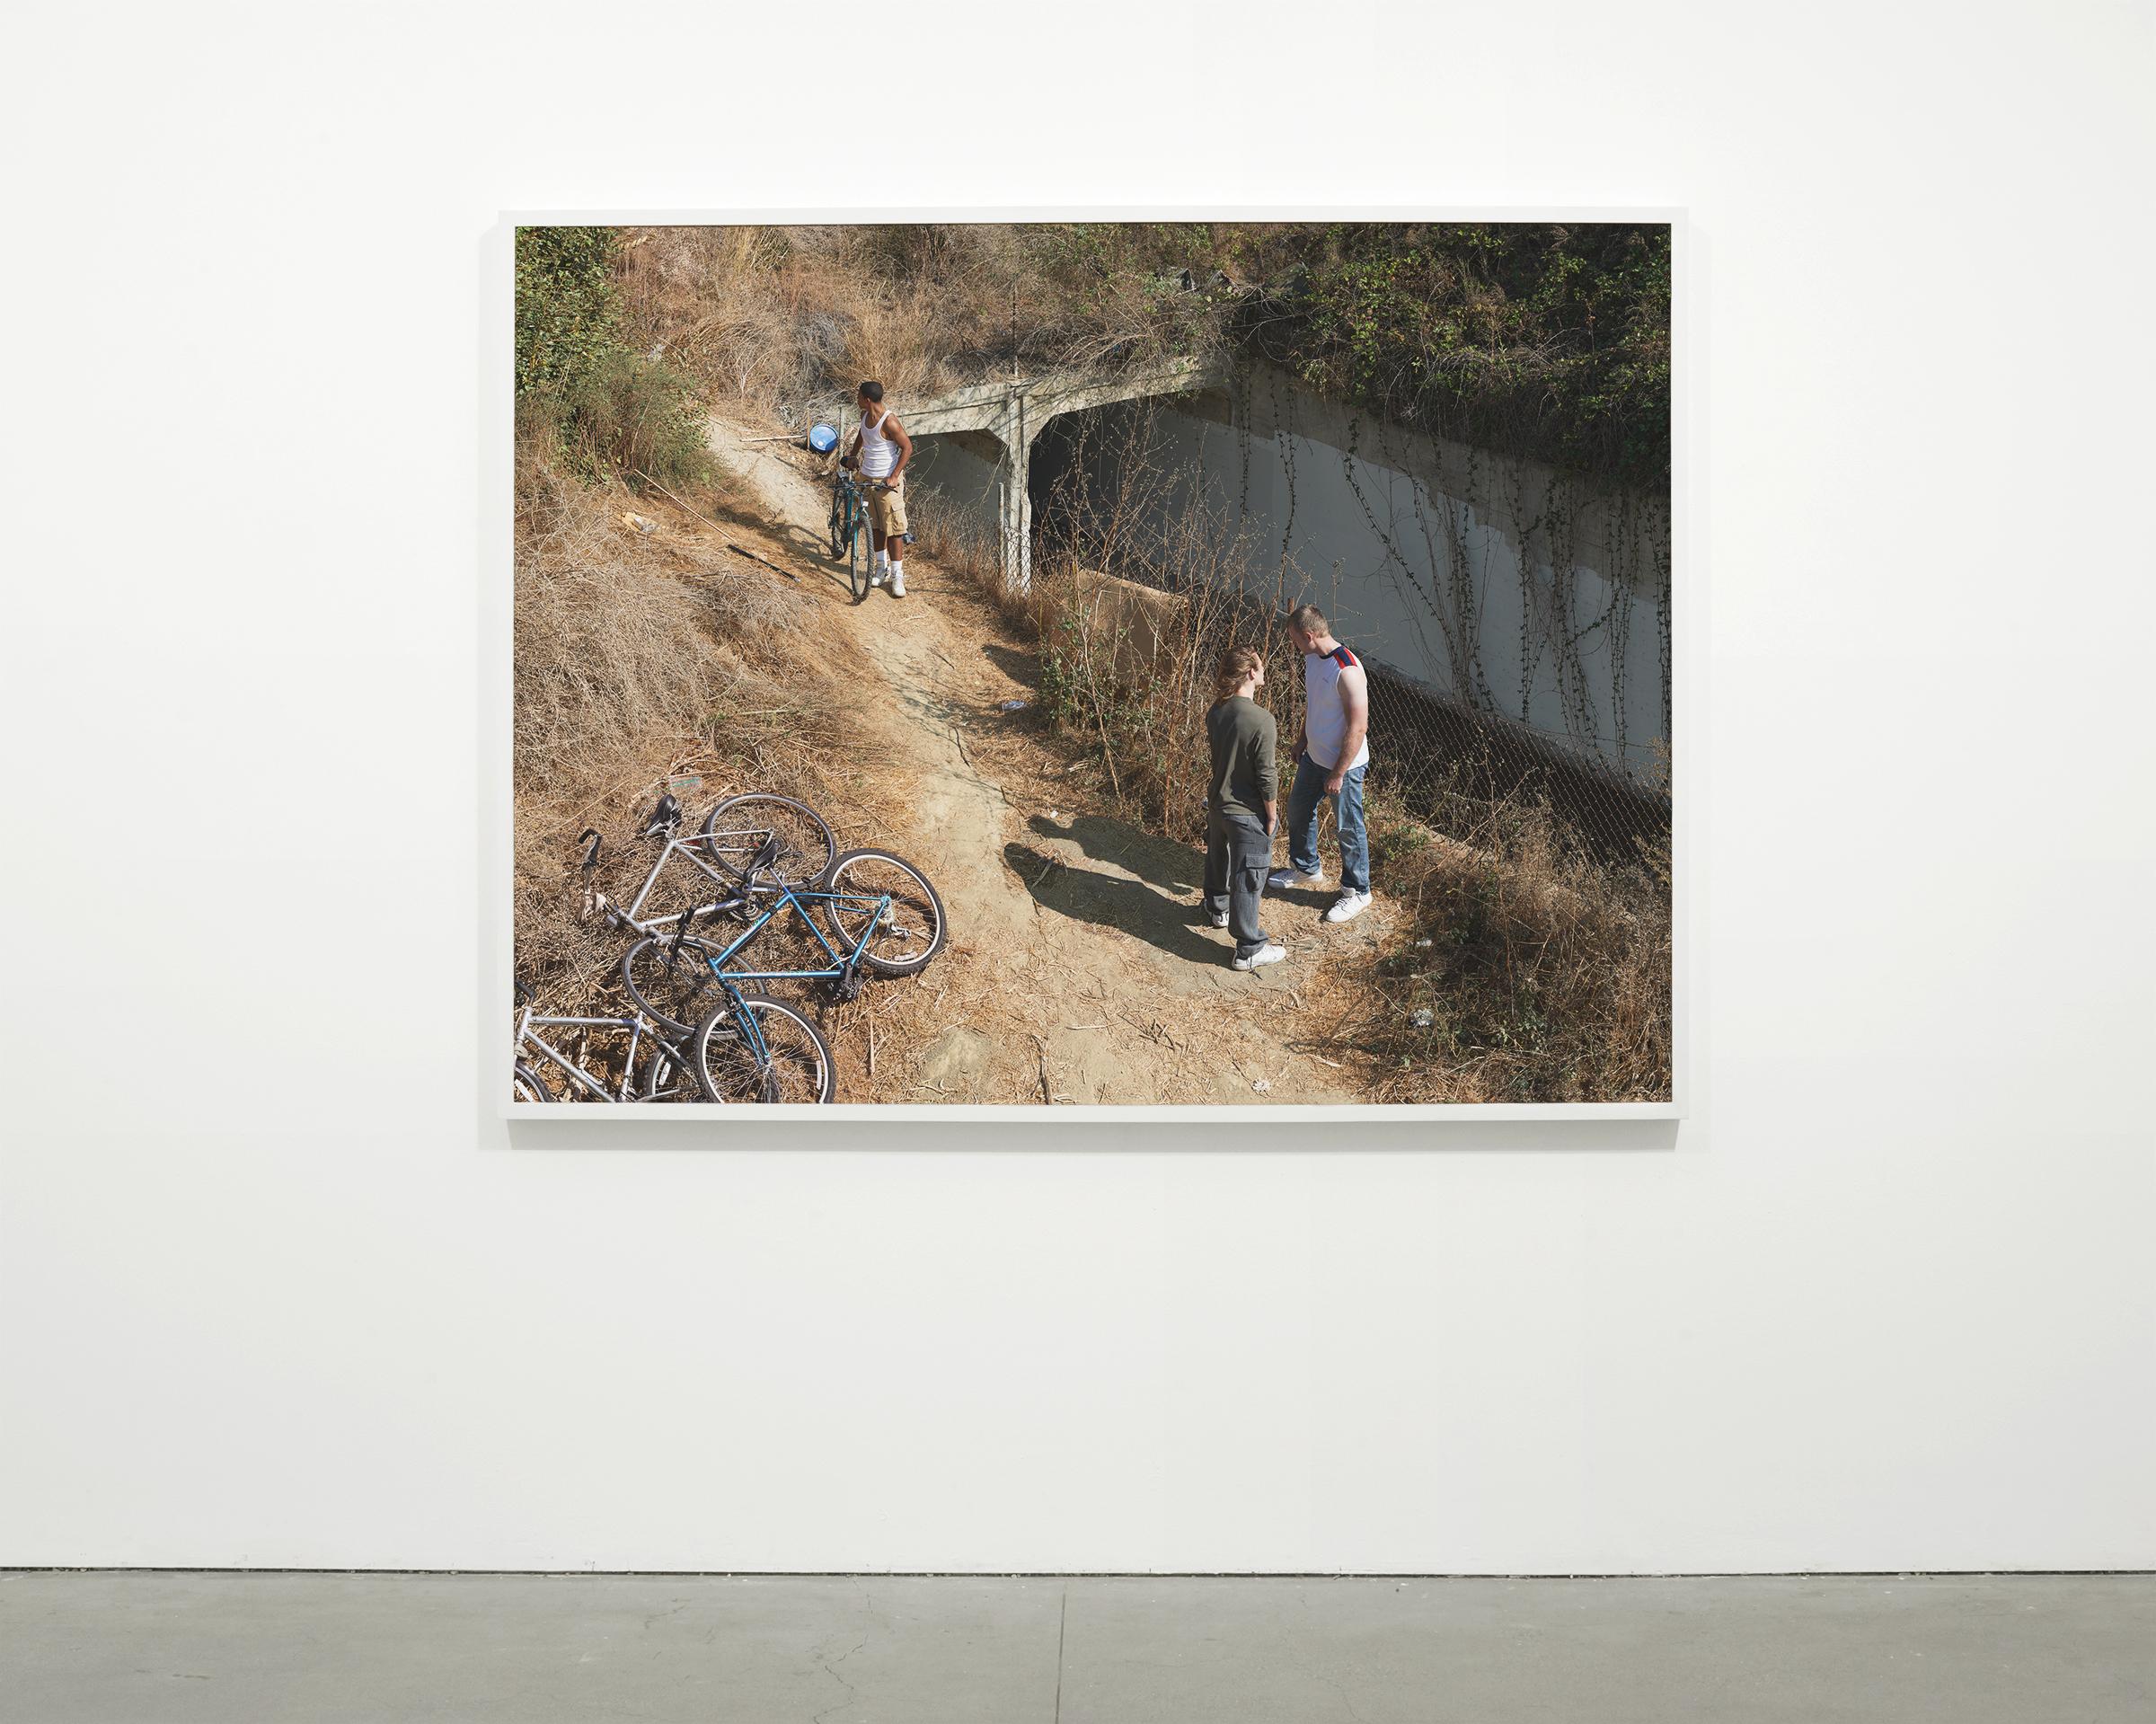 """Embankment (Ad Infinitum)"", 2017 - 2018  54 x 71 in. (137.15 x 180.35 cm)"